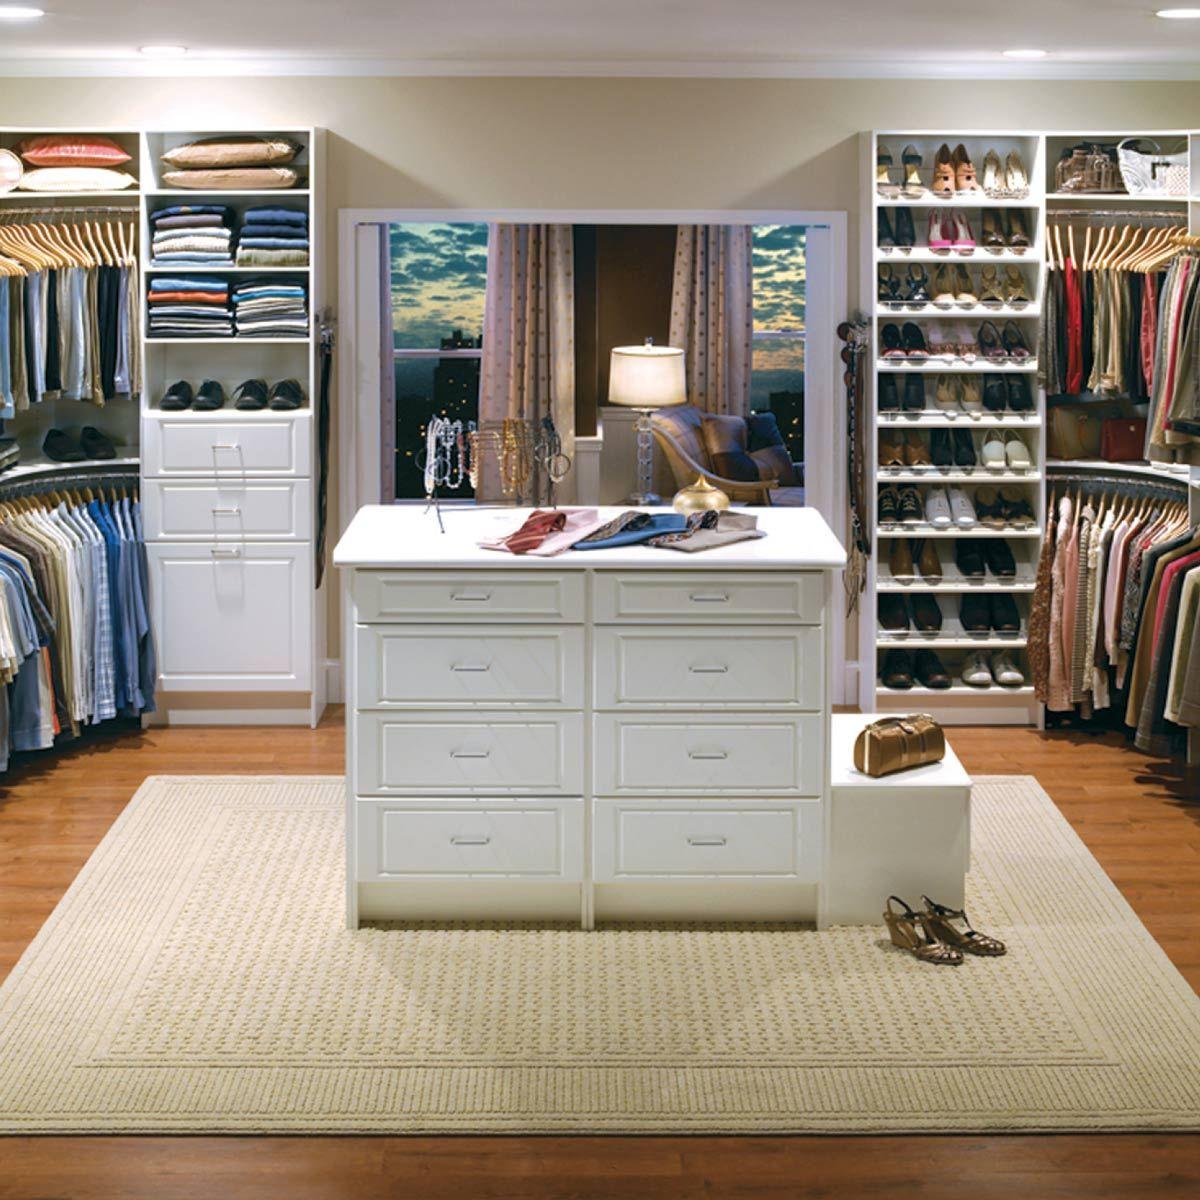 12 Walk In Closets To Die For Small Closet Design Closet Designs Big Closets